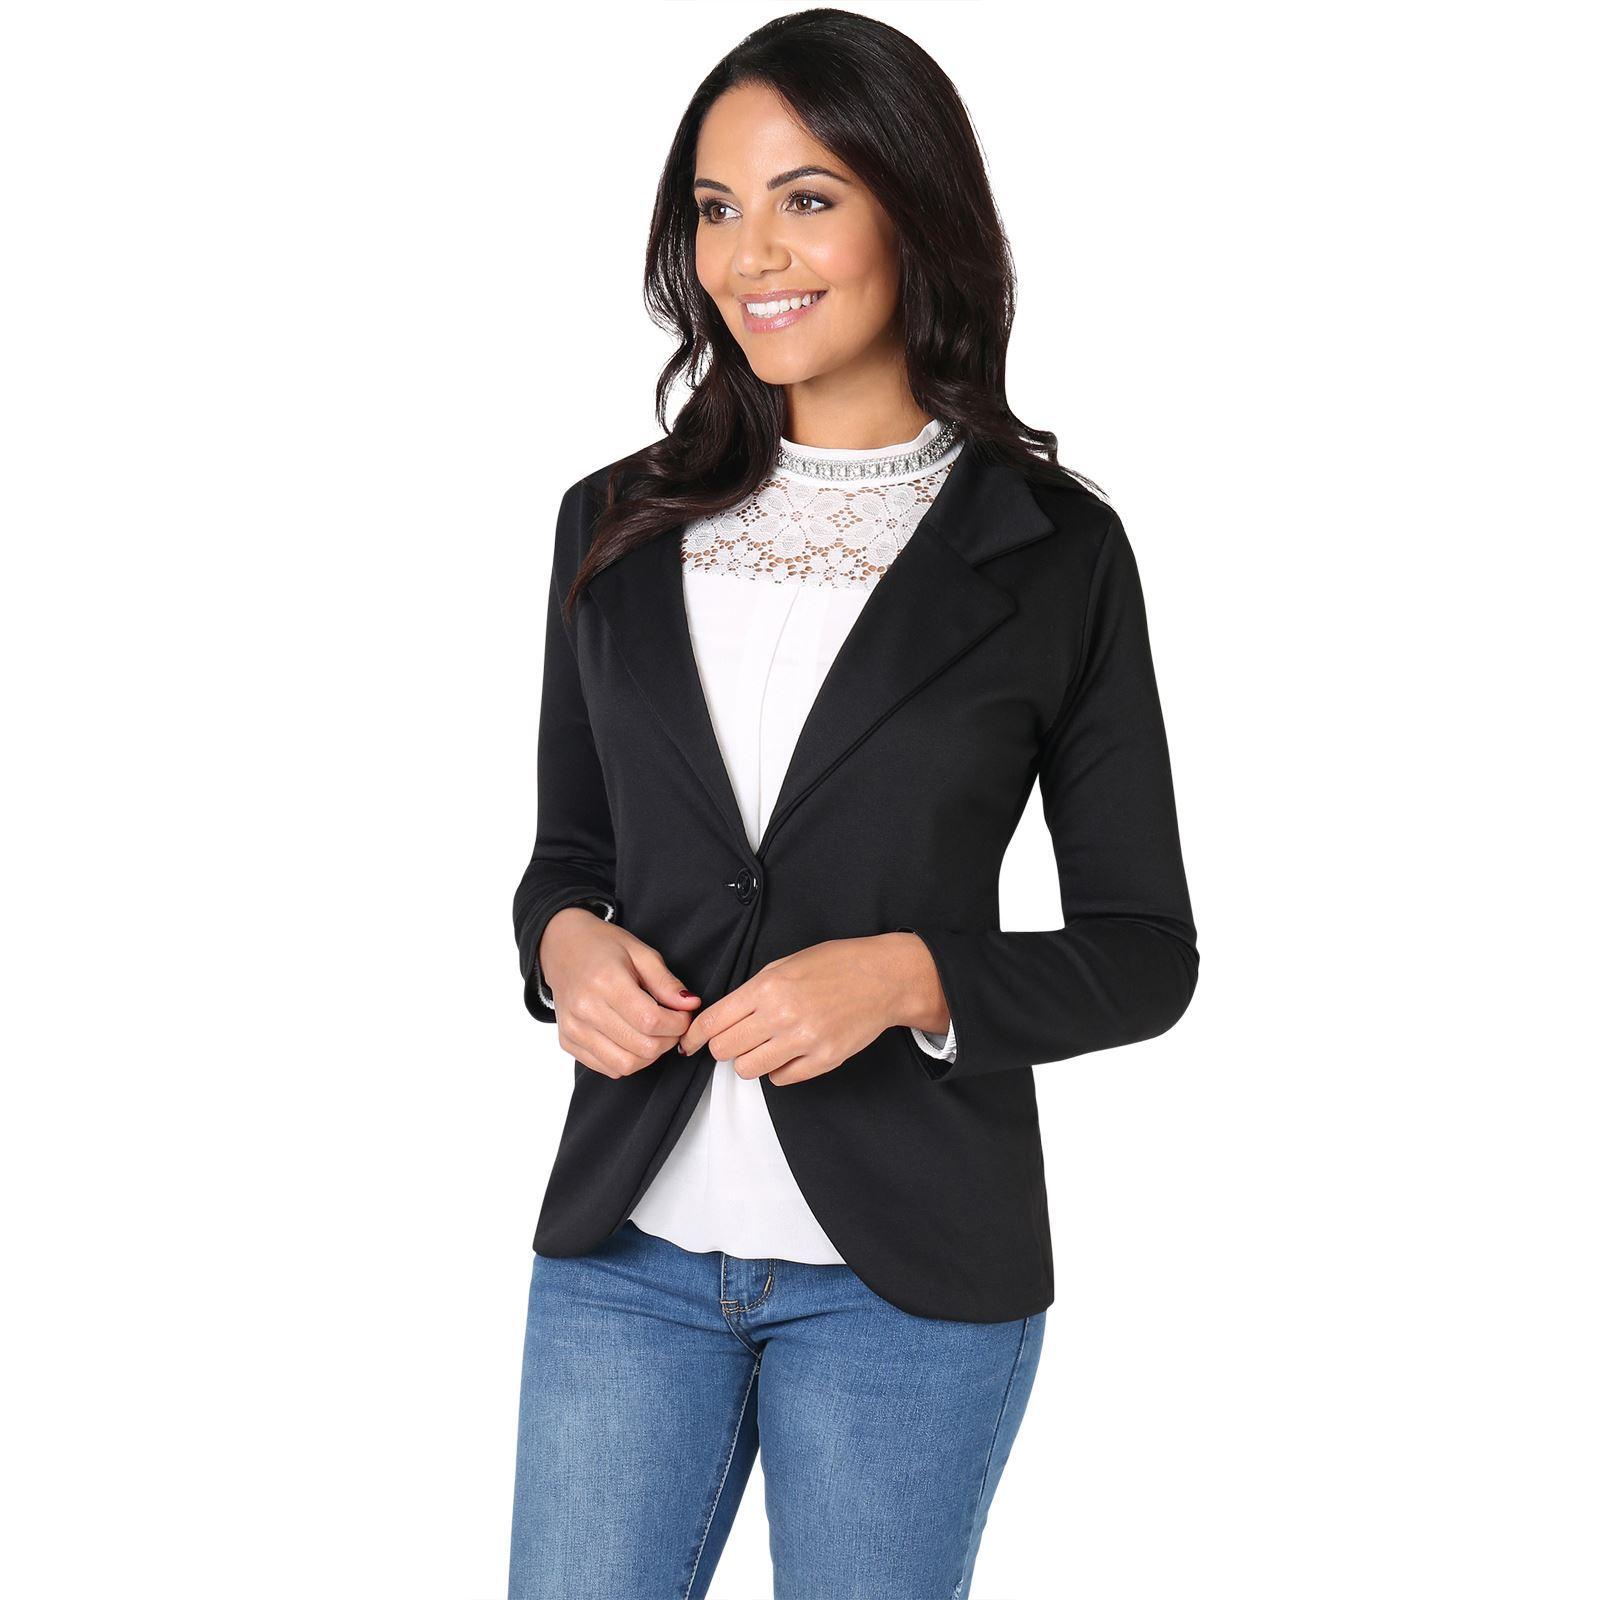 6619f181b942d Chaqueta Mujer Vestir Talla Grande Blazer Casual Elegante Barata ...